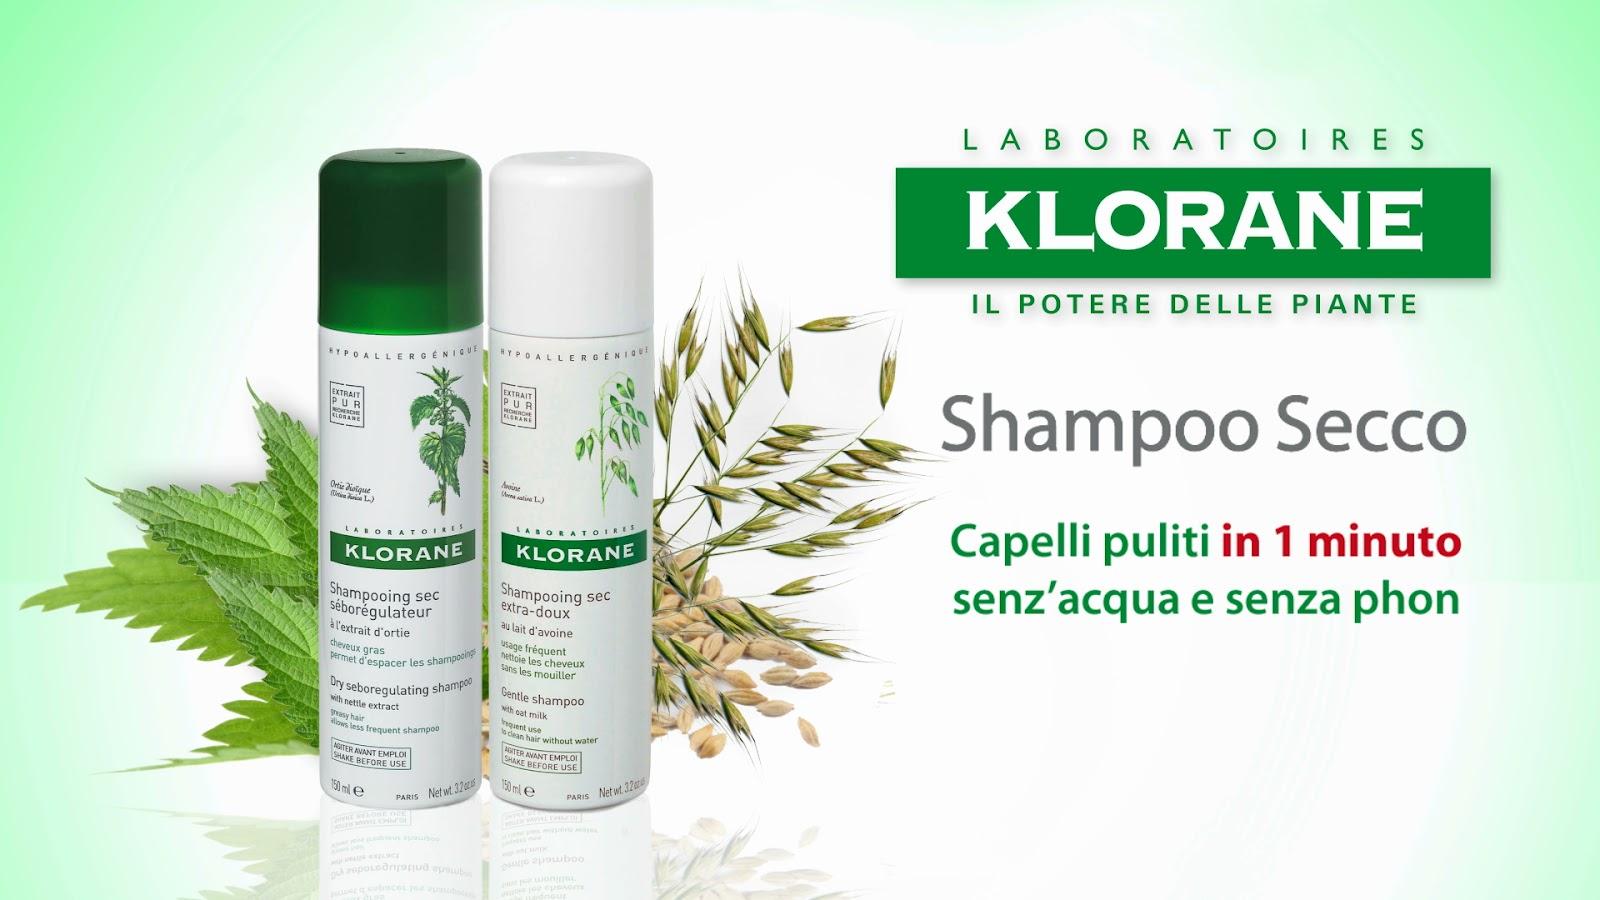 Soluzione fast per capelli puliti in un minuto: Klorane ...